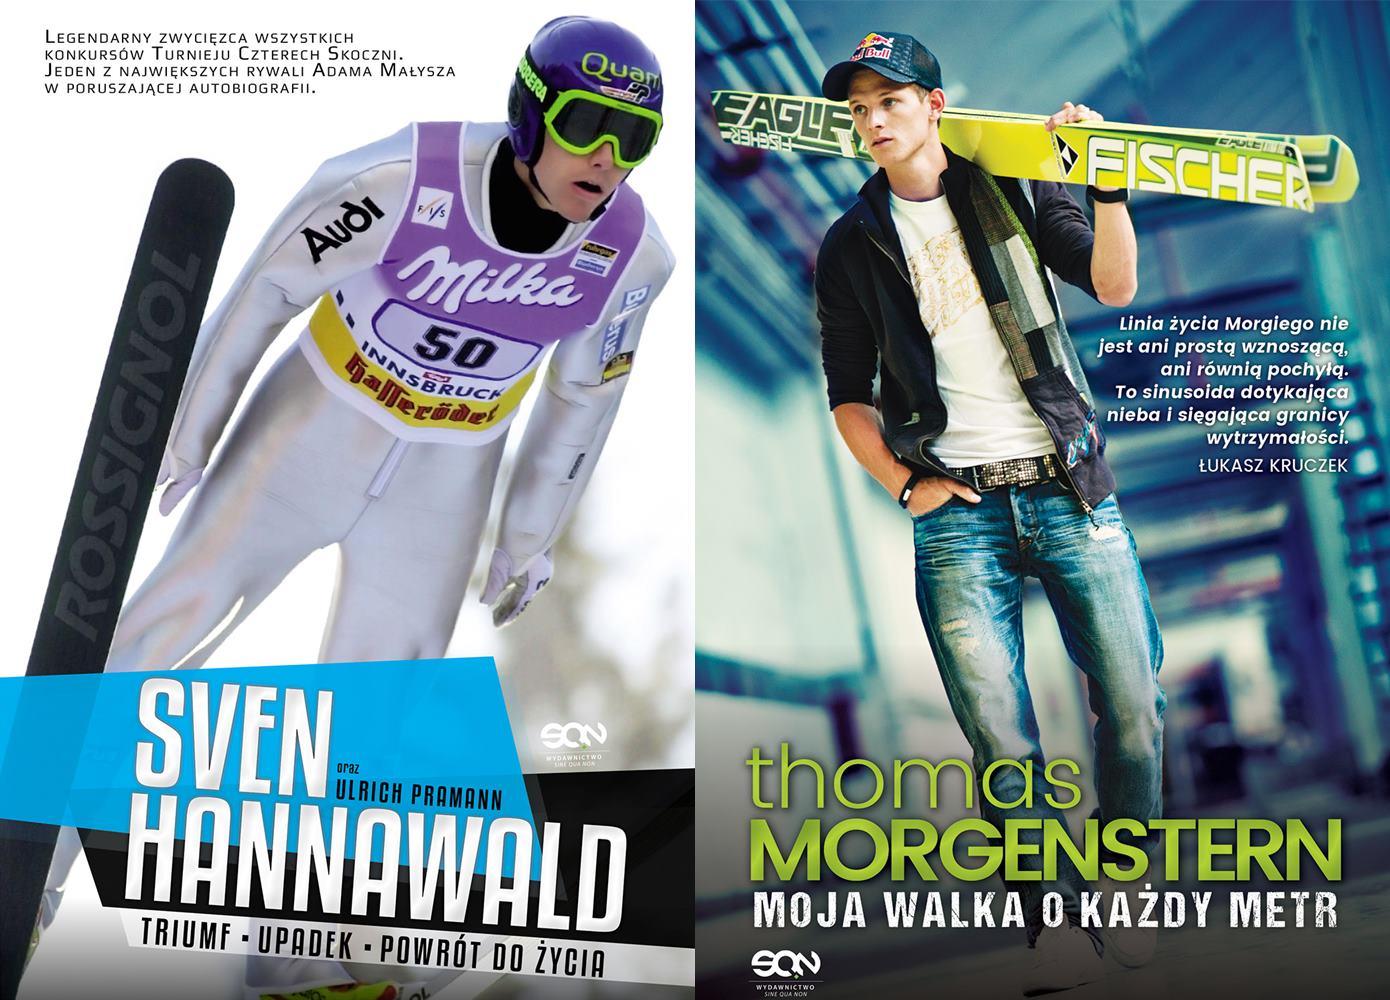 Hannawald-Morgenstern-książki